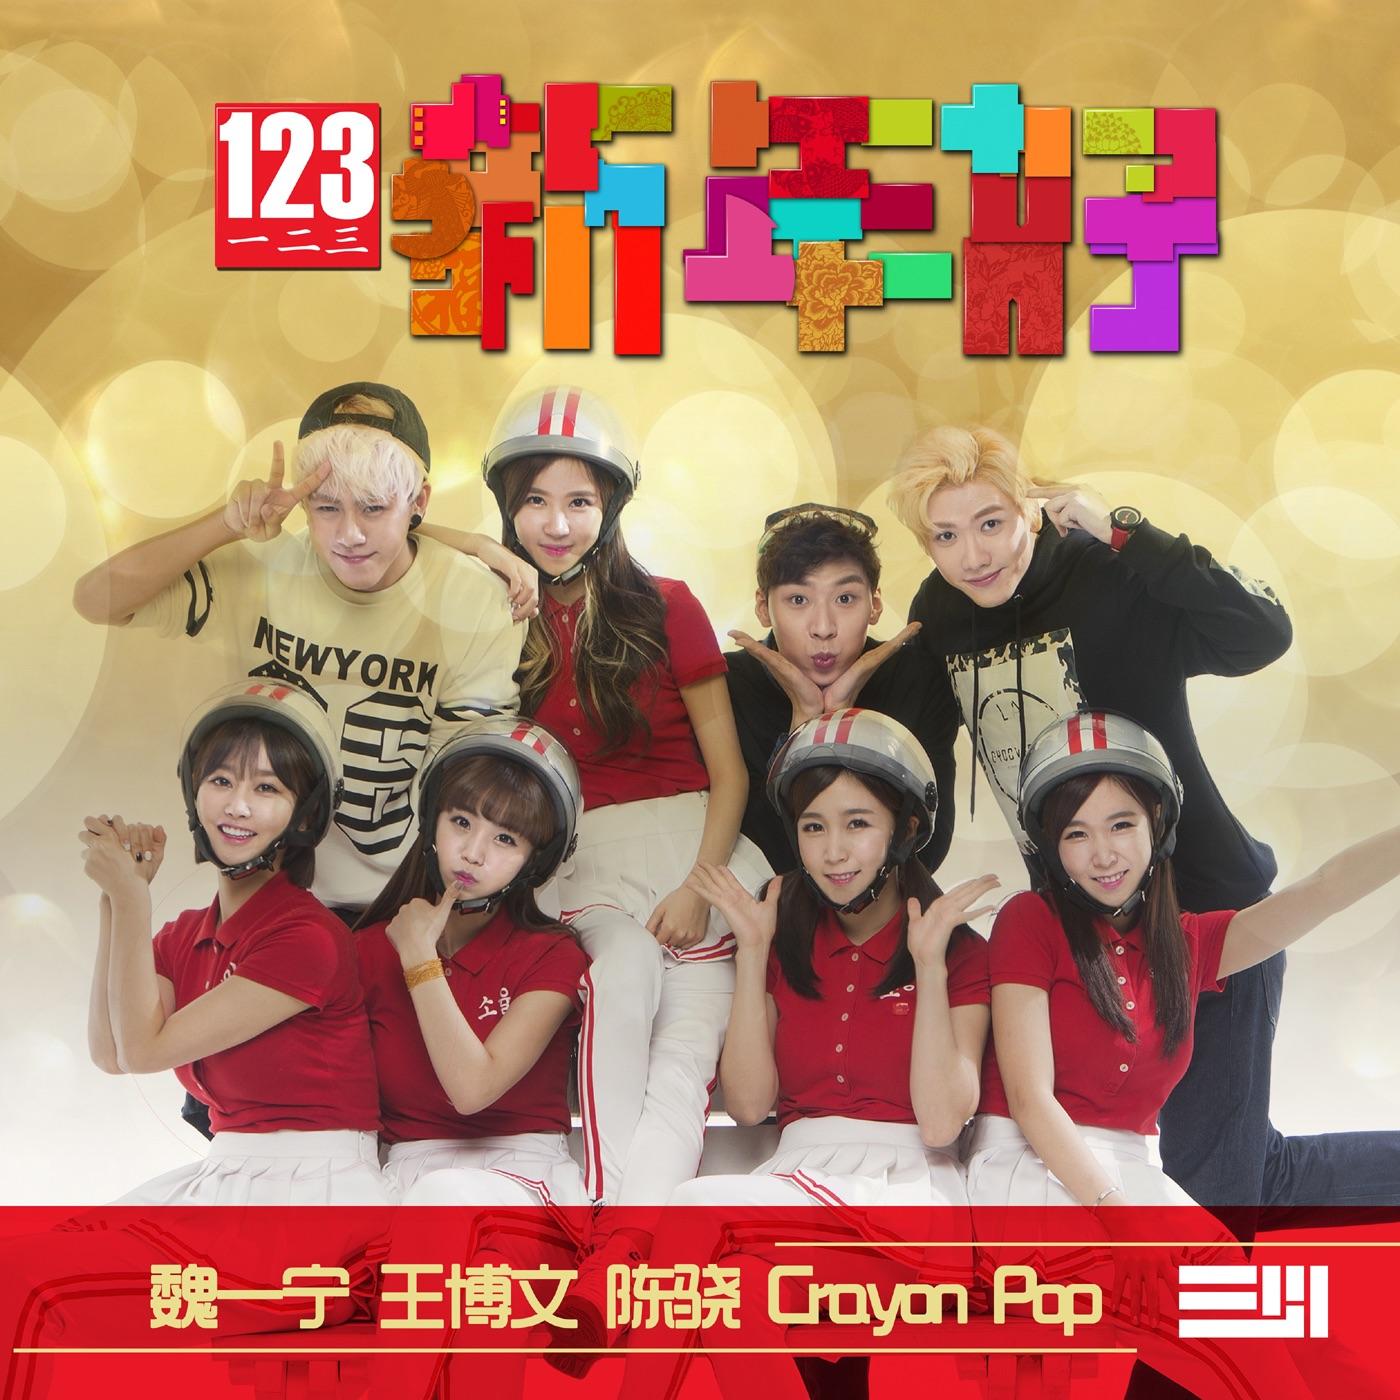 Crayon Pop, 王博文, 魏一寧 & 陳驍 - 123新年好 - Single